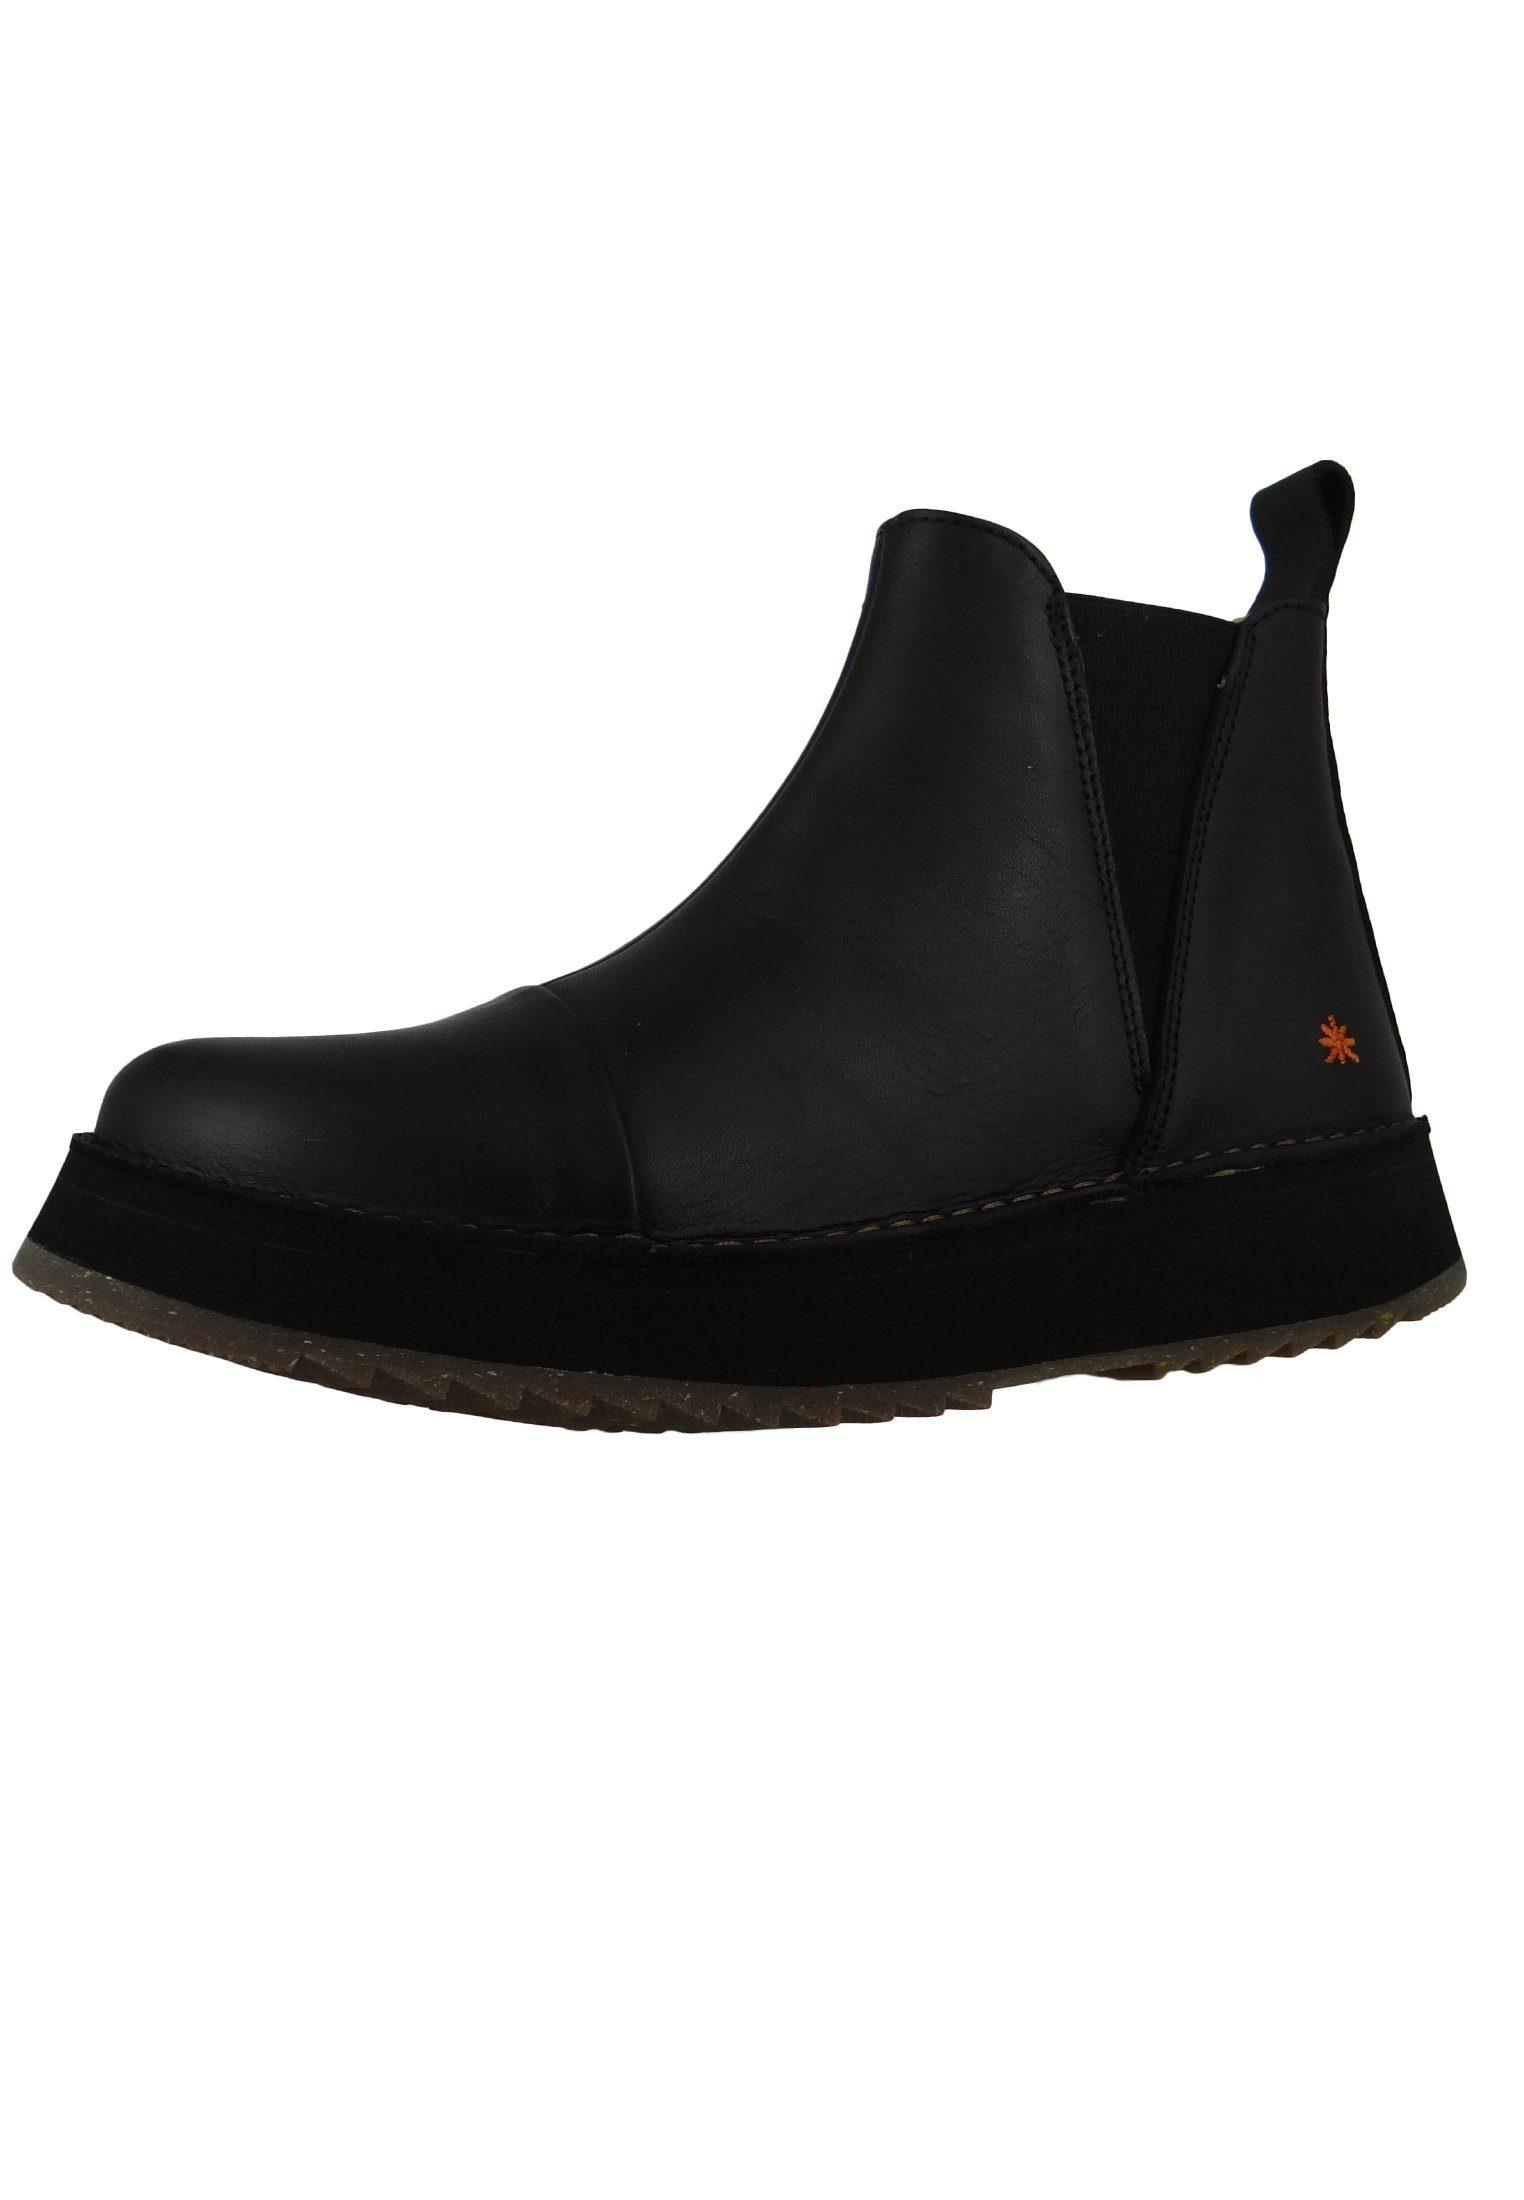 Muck Boots Damenstiefel Outdoor Reiten Angeln Artctic Ice AG Female herrlich